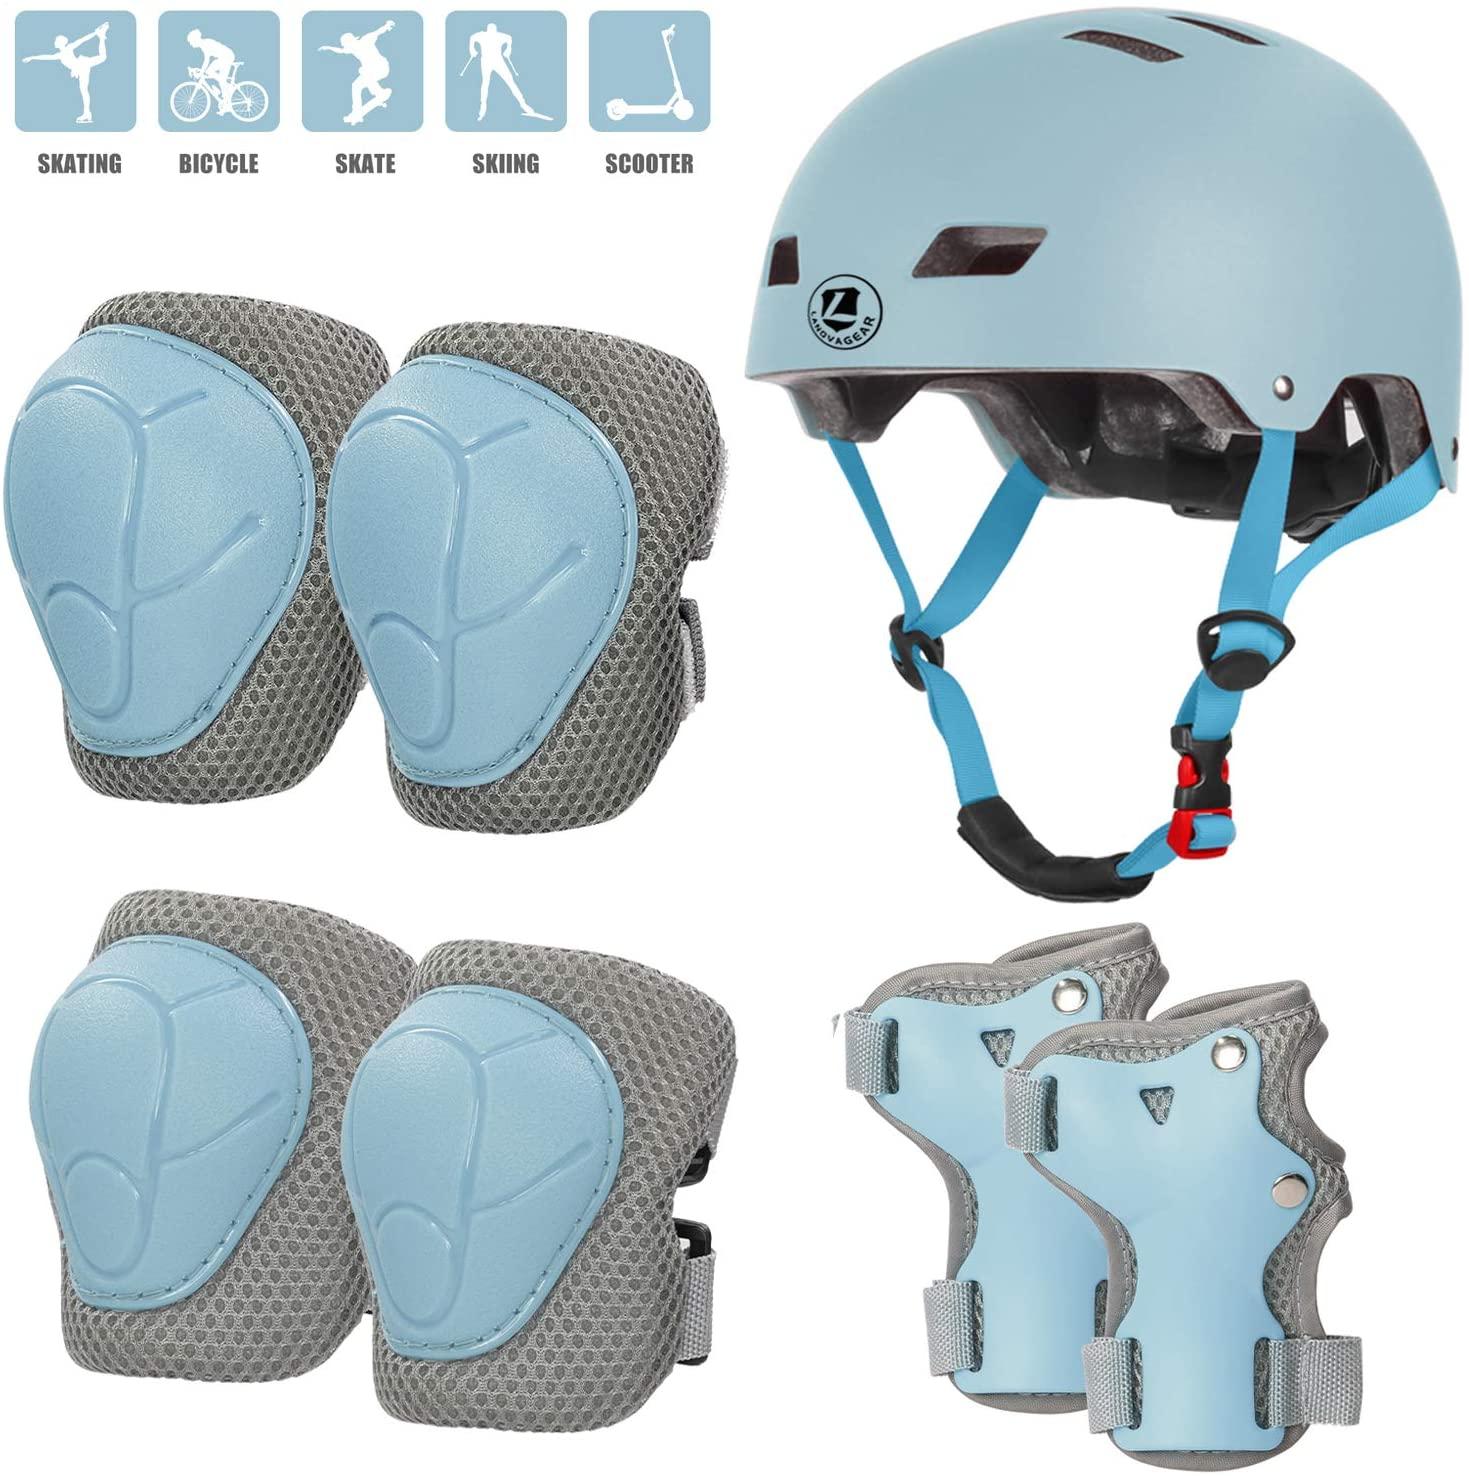 LANOVAGEAR Kids Helmet with Knee Elbow Wrist Pads (Age 2-8), Adjustable Toddler Bike Helmet for Skating Scooter Roller Skate Cycling